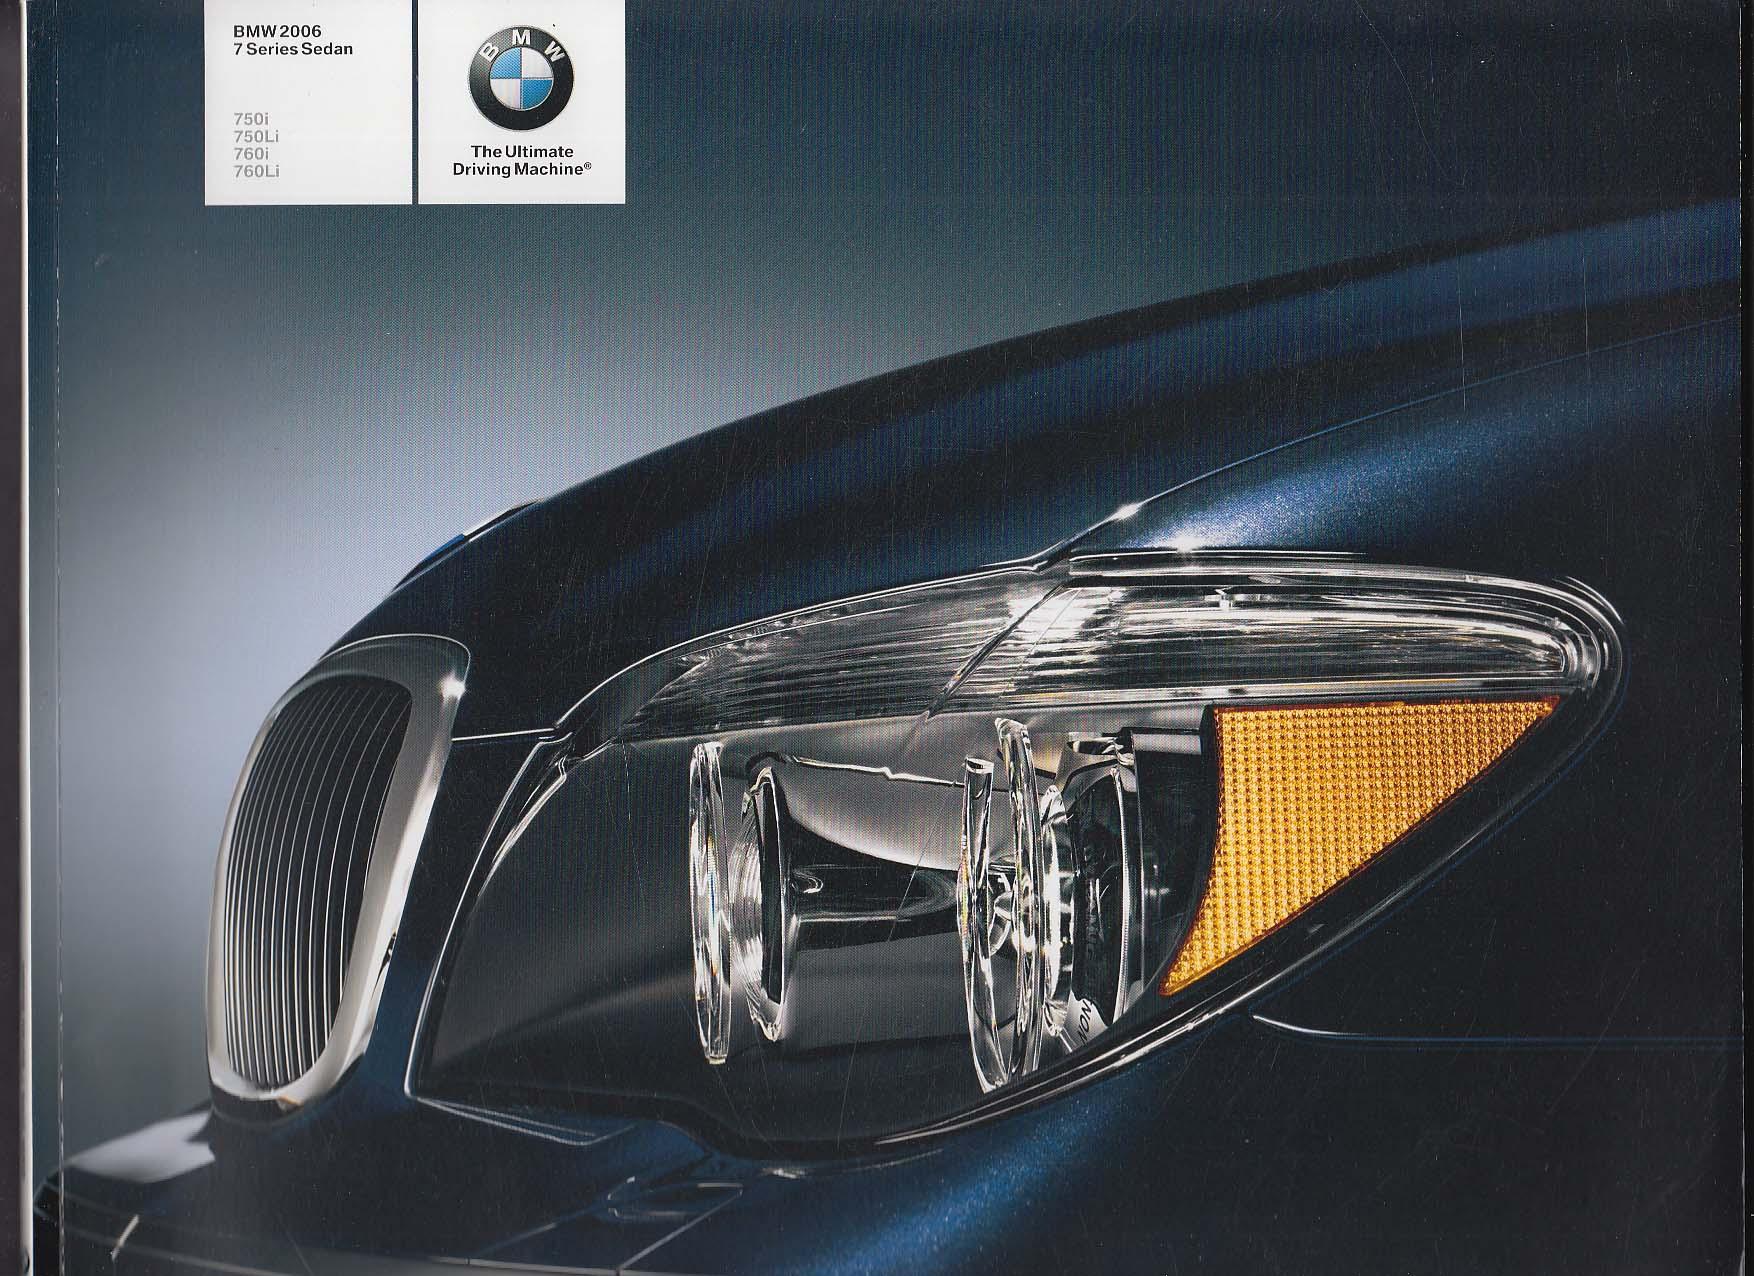 Image for 2006 BMW 7 Series Sedan sales brochure catalog 750i 750Li 760i 760Li